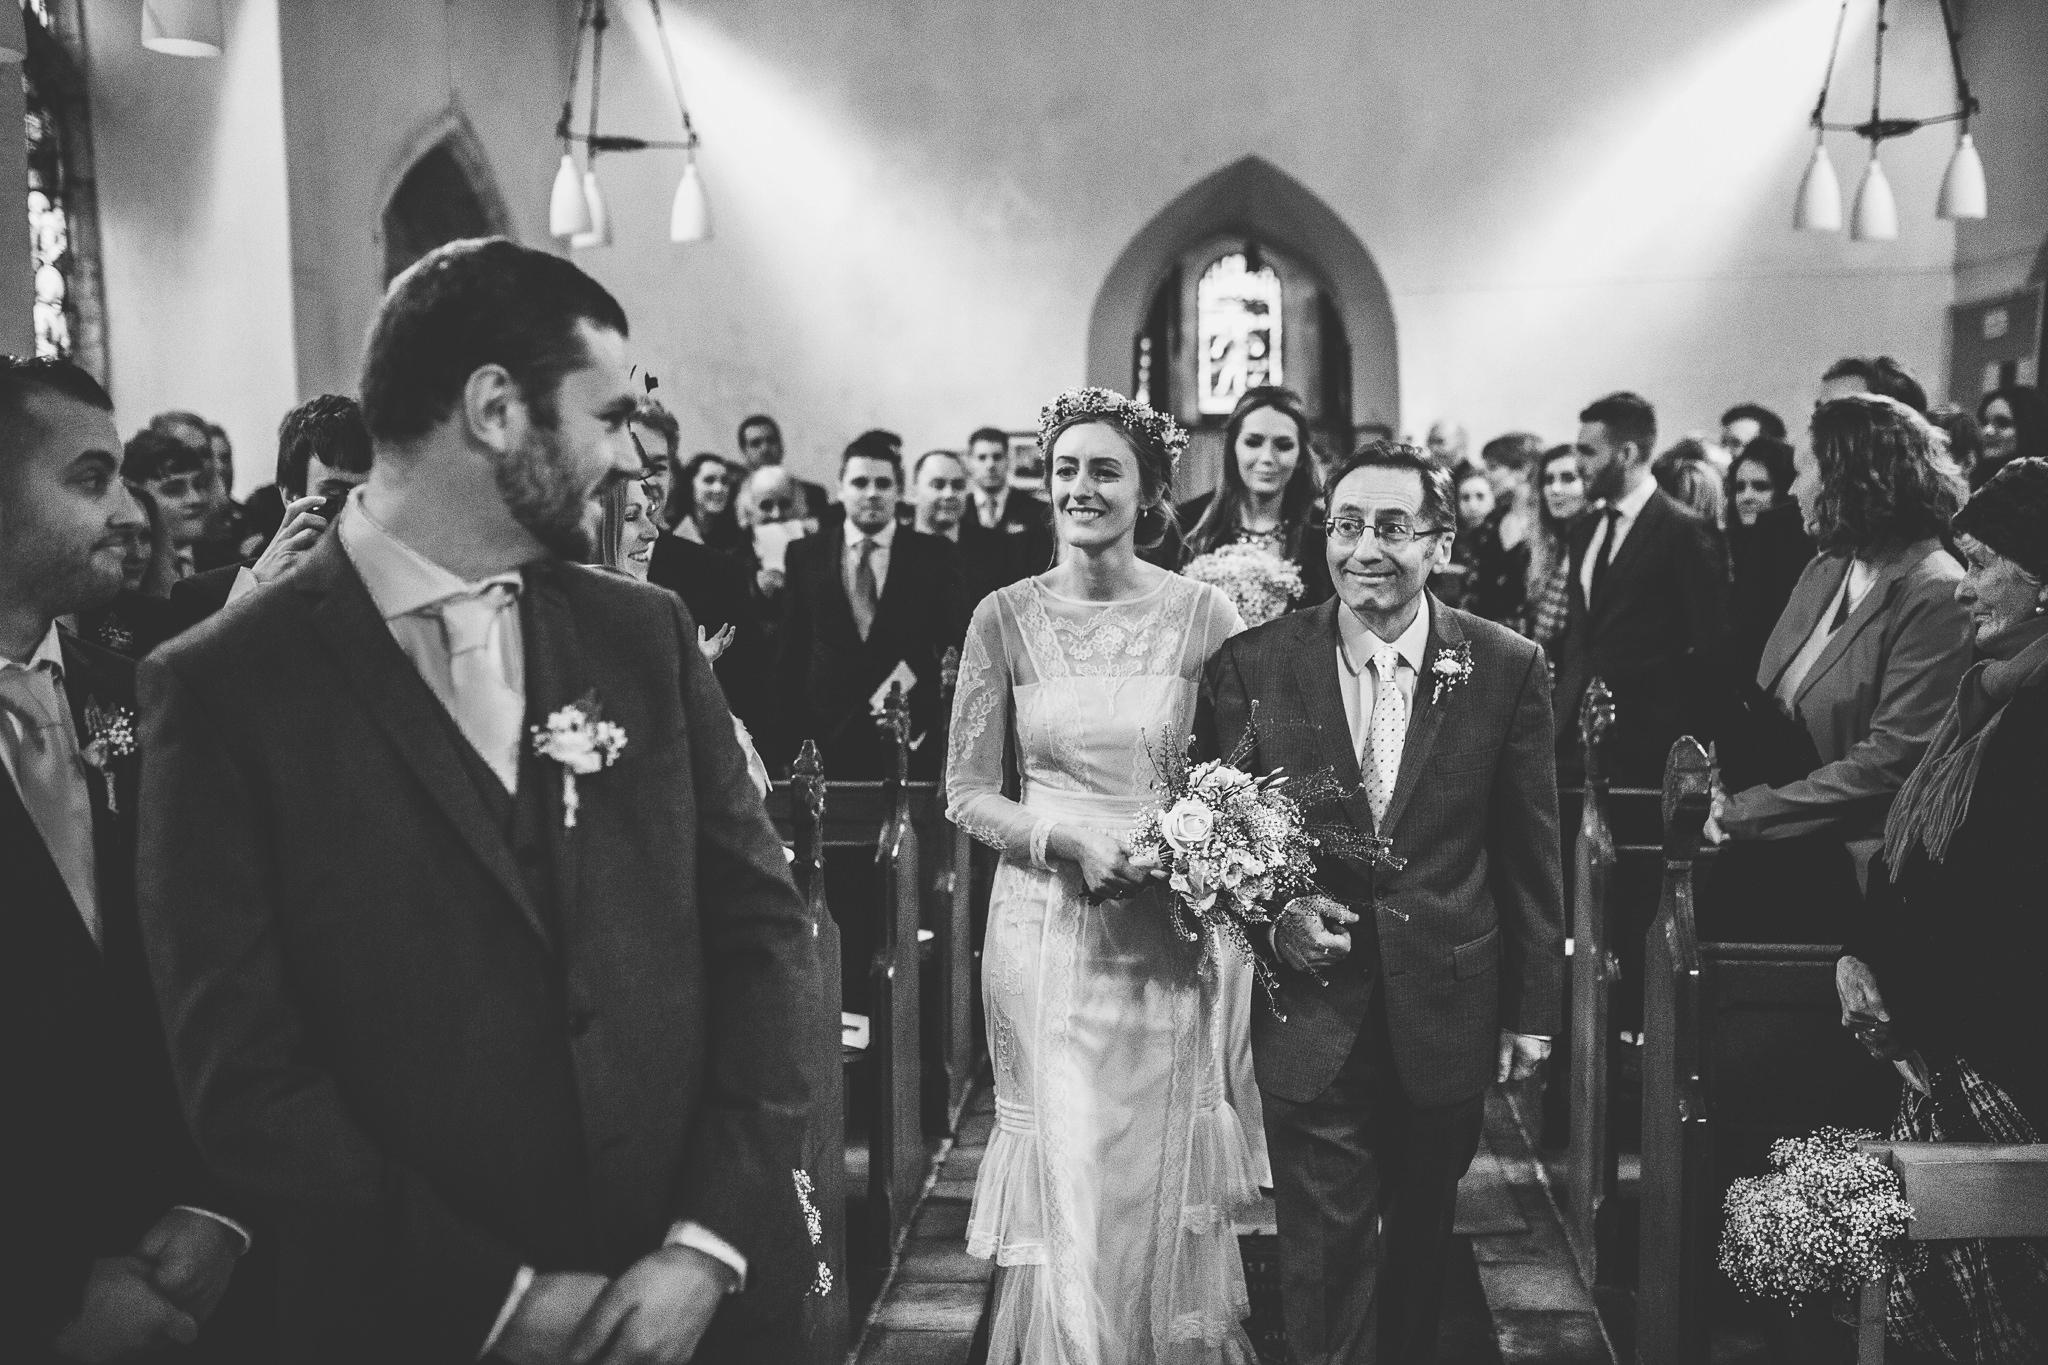 Creative-reportage-wedding-photography-90020